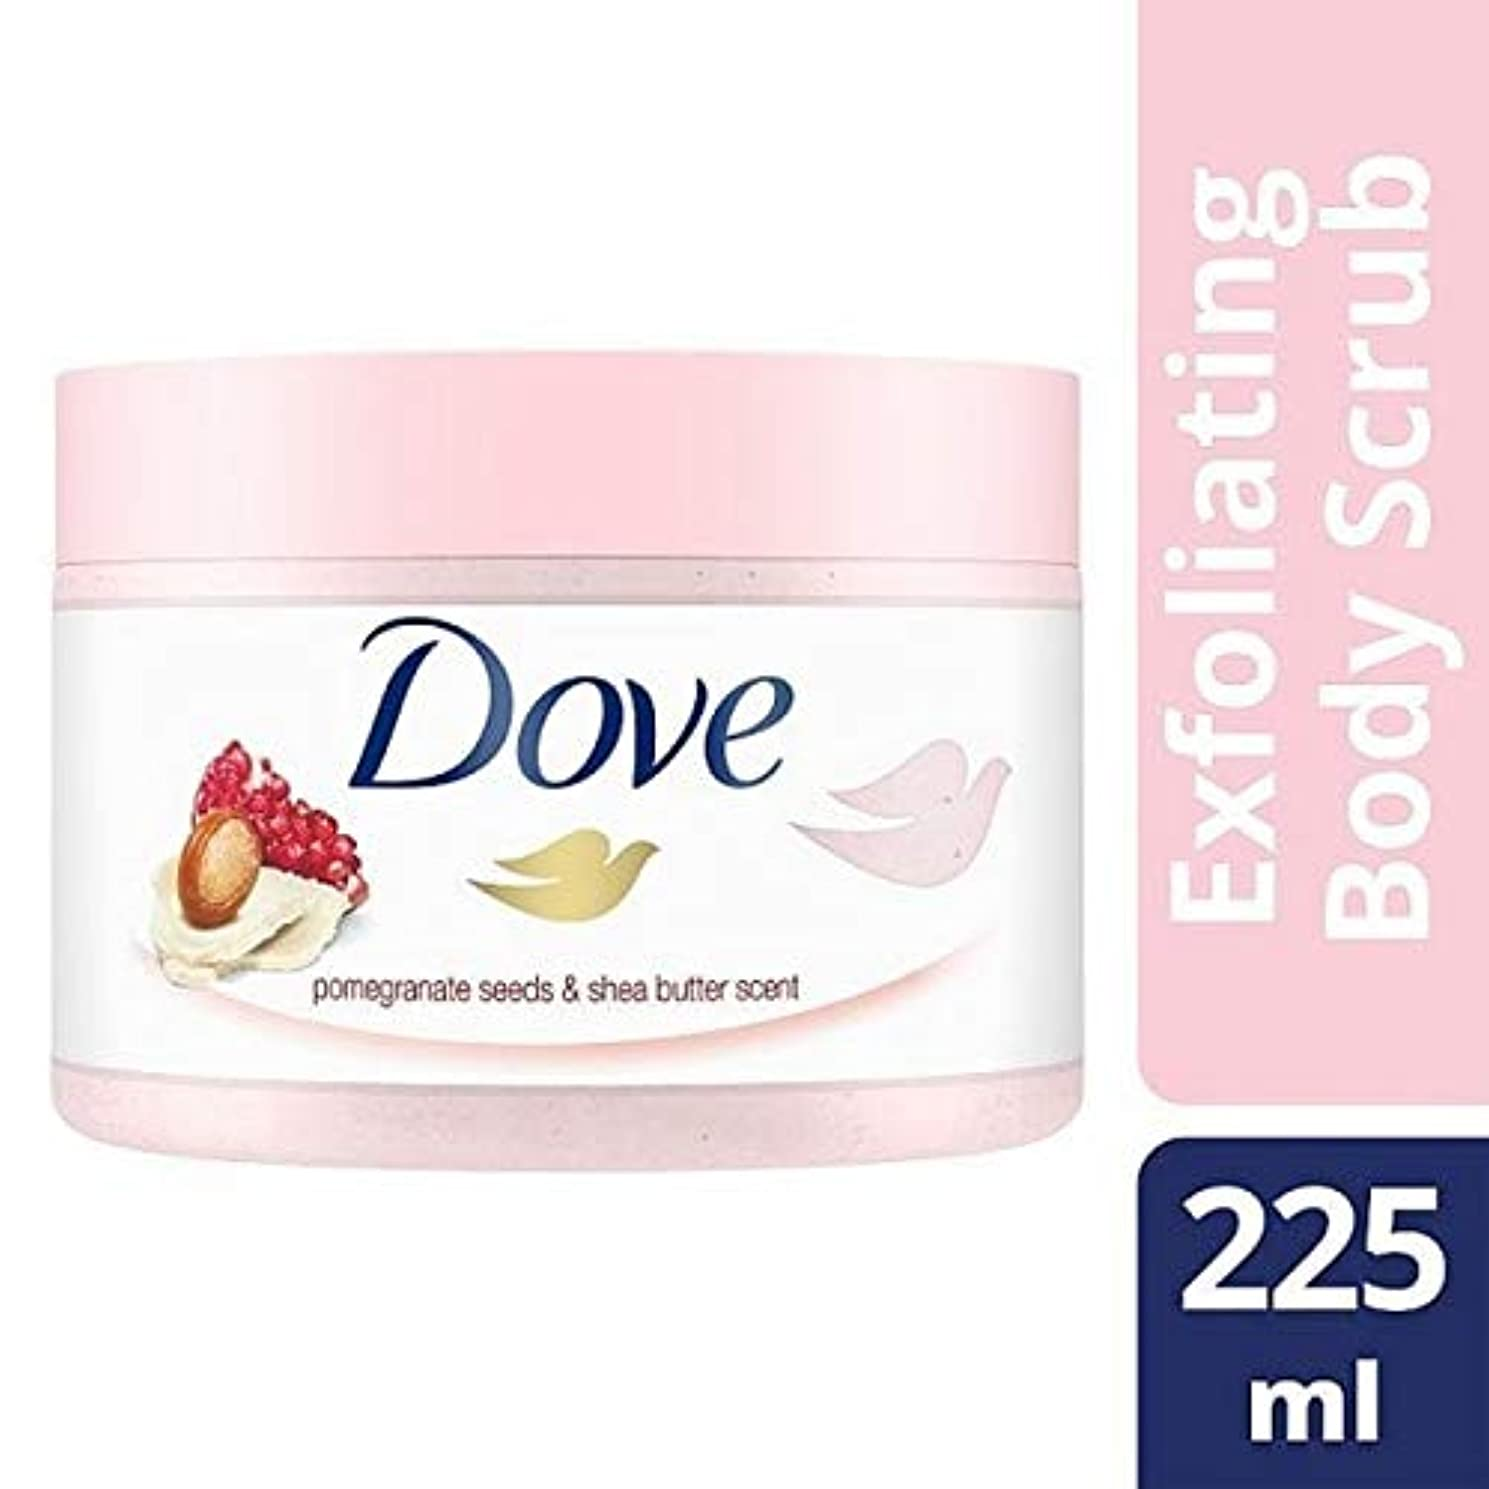 [Dove ] 225ミリリットルボディスクラブザクロ種子を剥離鳩 - Dove Exfoliating Body Scrub Pomegranate Seeds 225ml [並行輸入品]